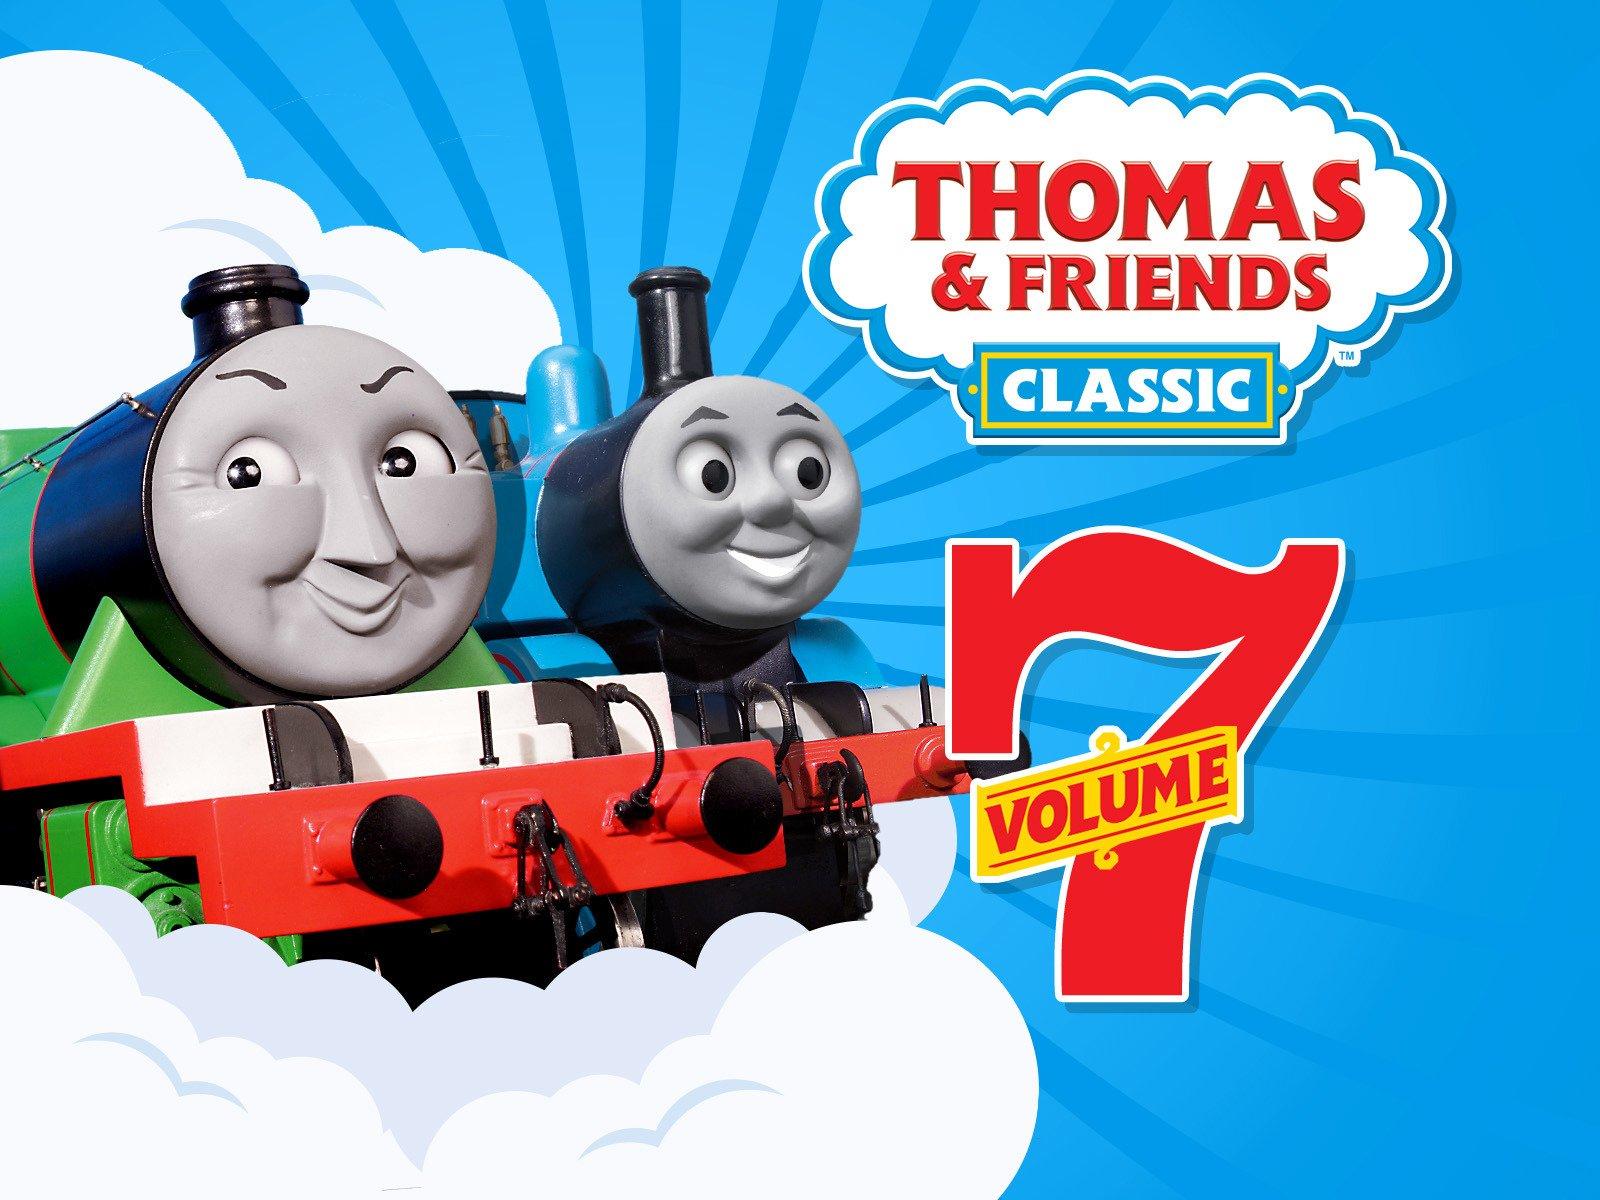 Thomas & Friends Classic Volume 7